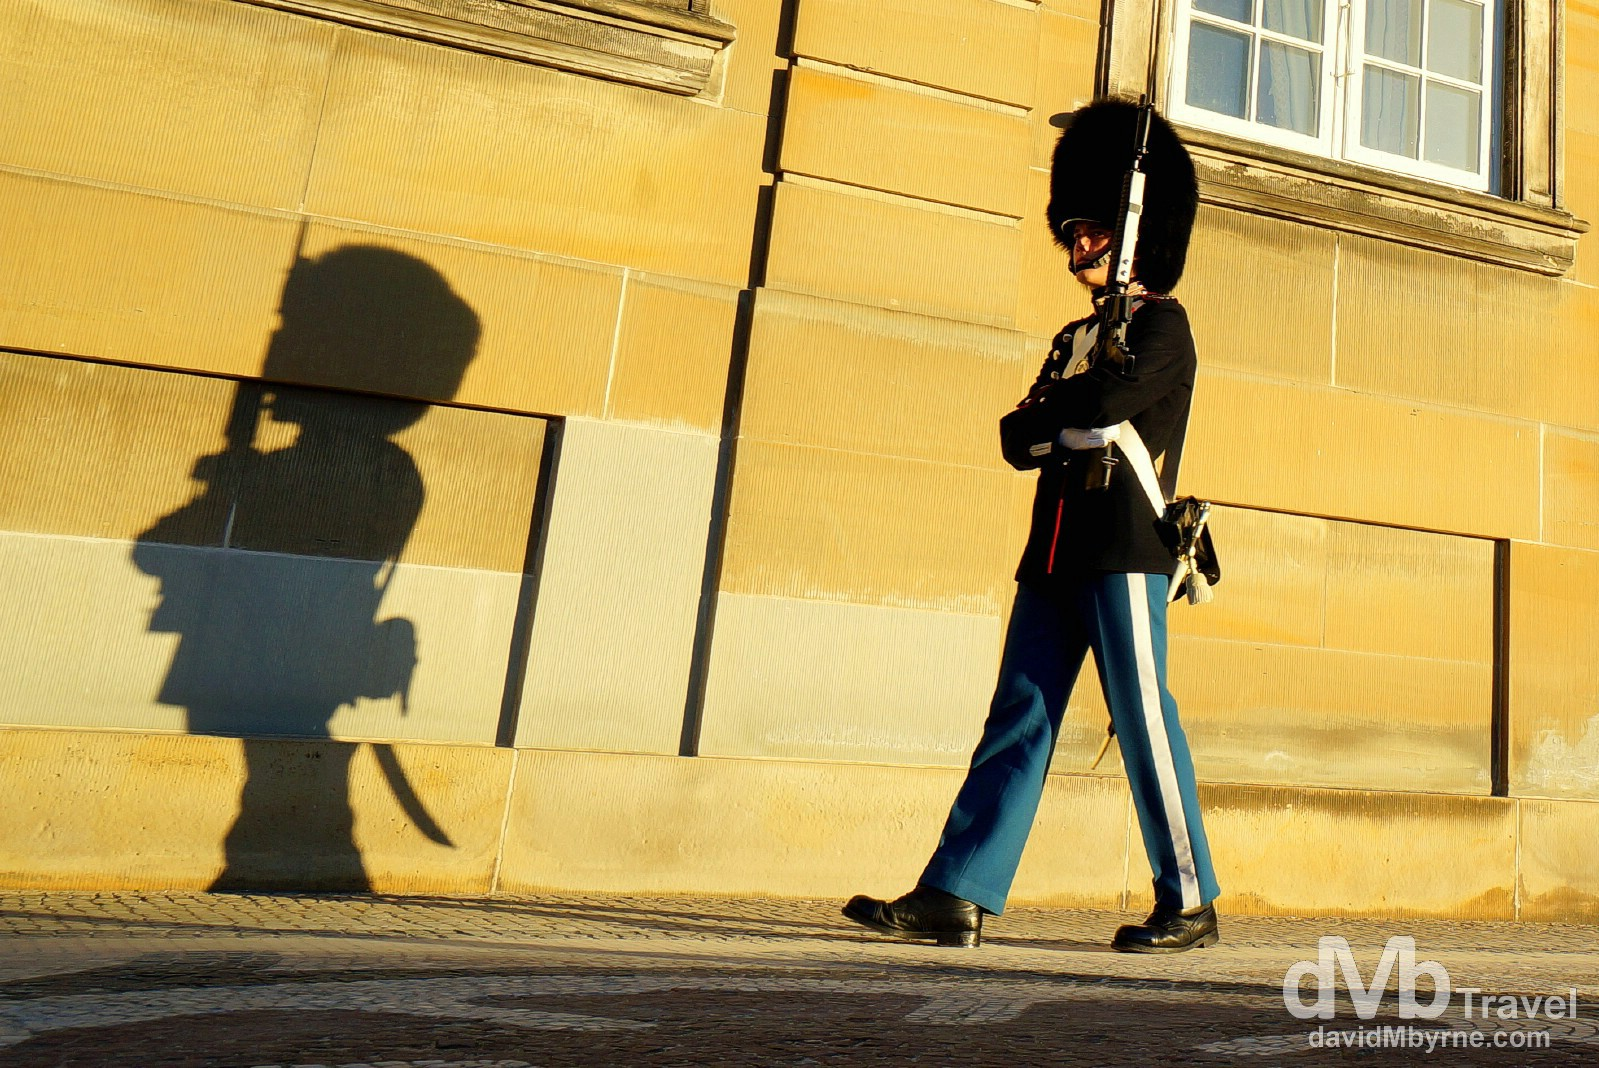 A guard outside Amalienborg, the winter residence of the Danish Royal family, in Copenhagen, Denmark. March 12th, 2014 (Nex-5r || SEL 18-55mm || 18mm, 1/160sec, f/8.0, iso100)